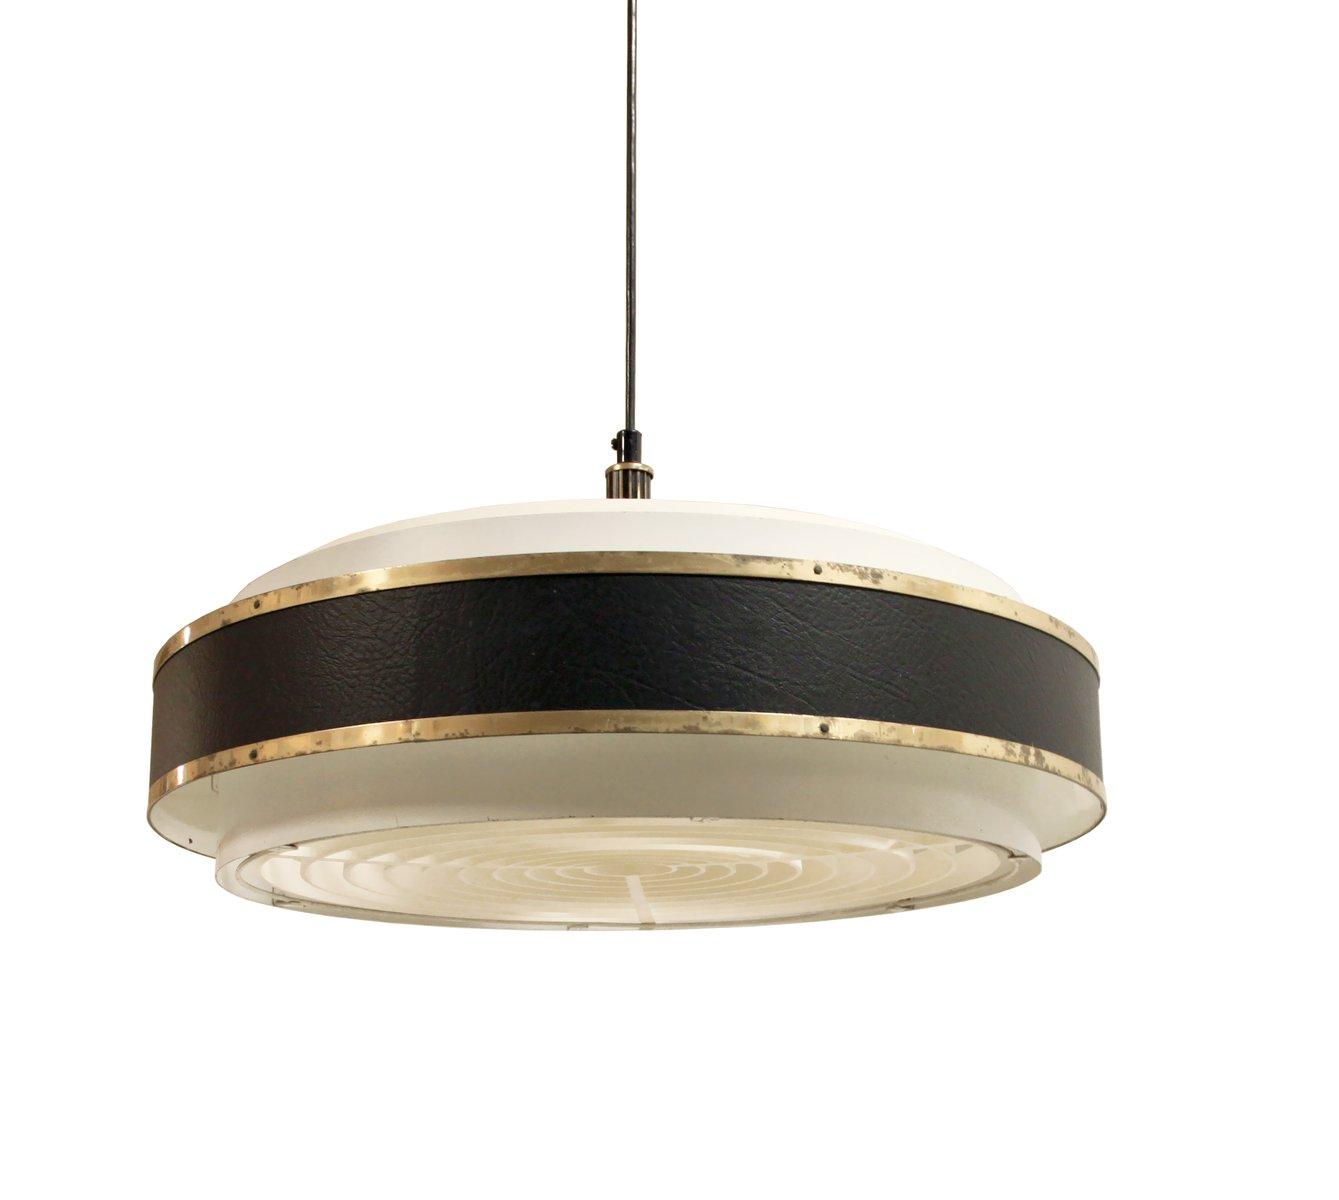 mid century pendant lighting. Mid Century Ceiling Lighting Pendant O